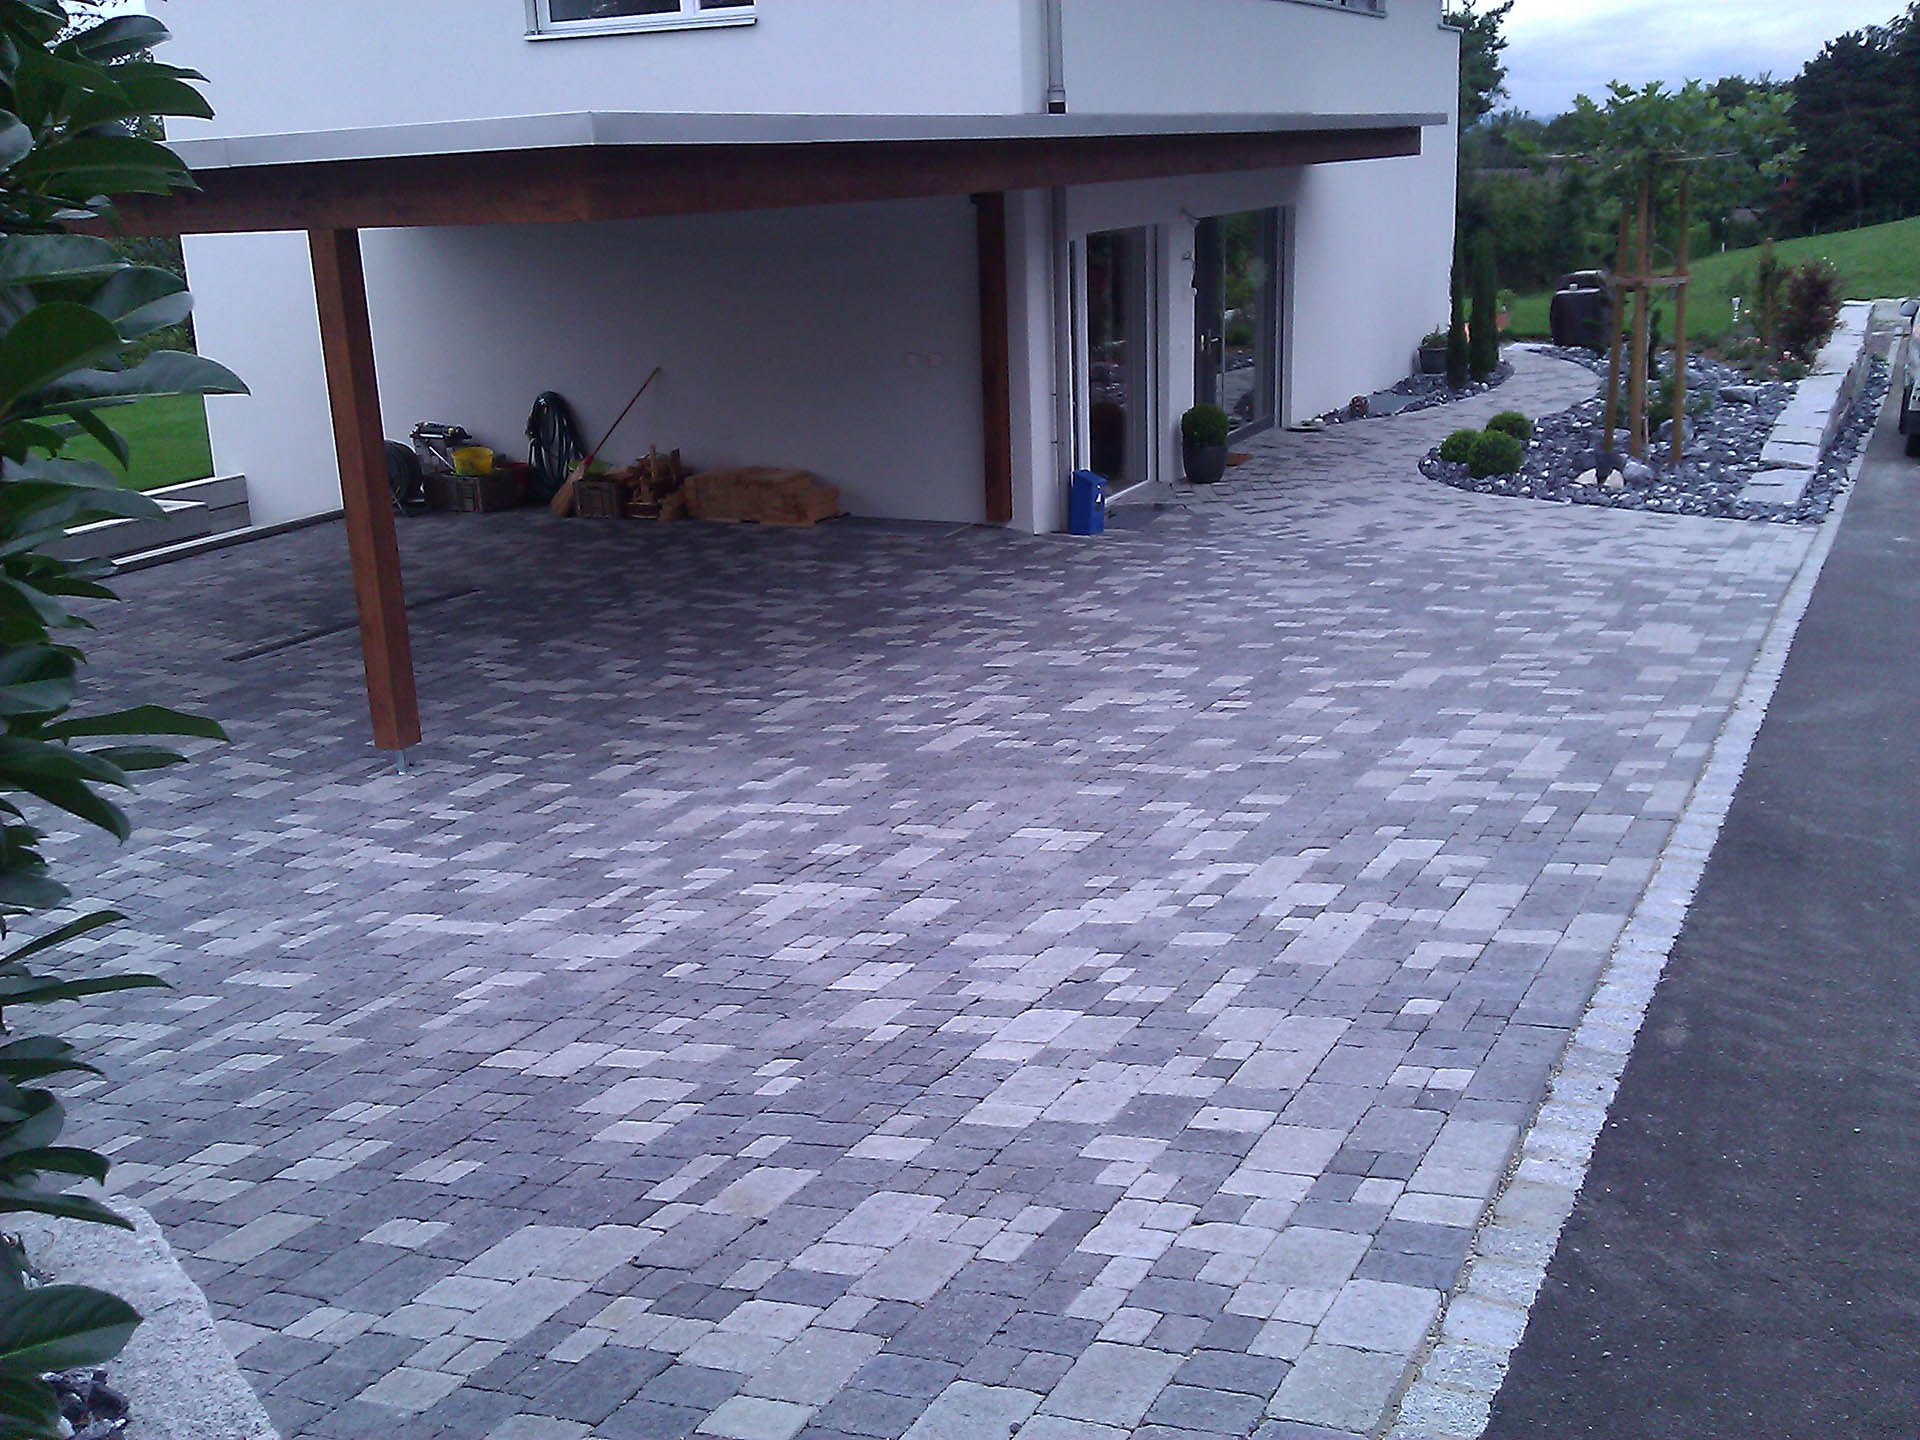 Murpf_Rolf_HägendorfWP_000227